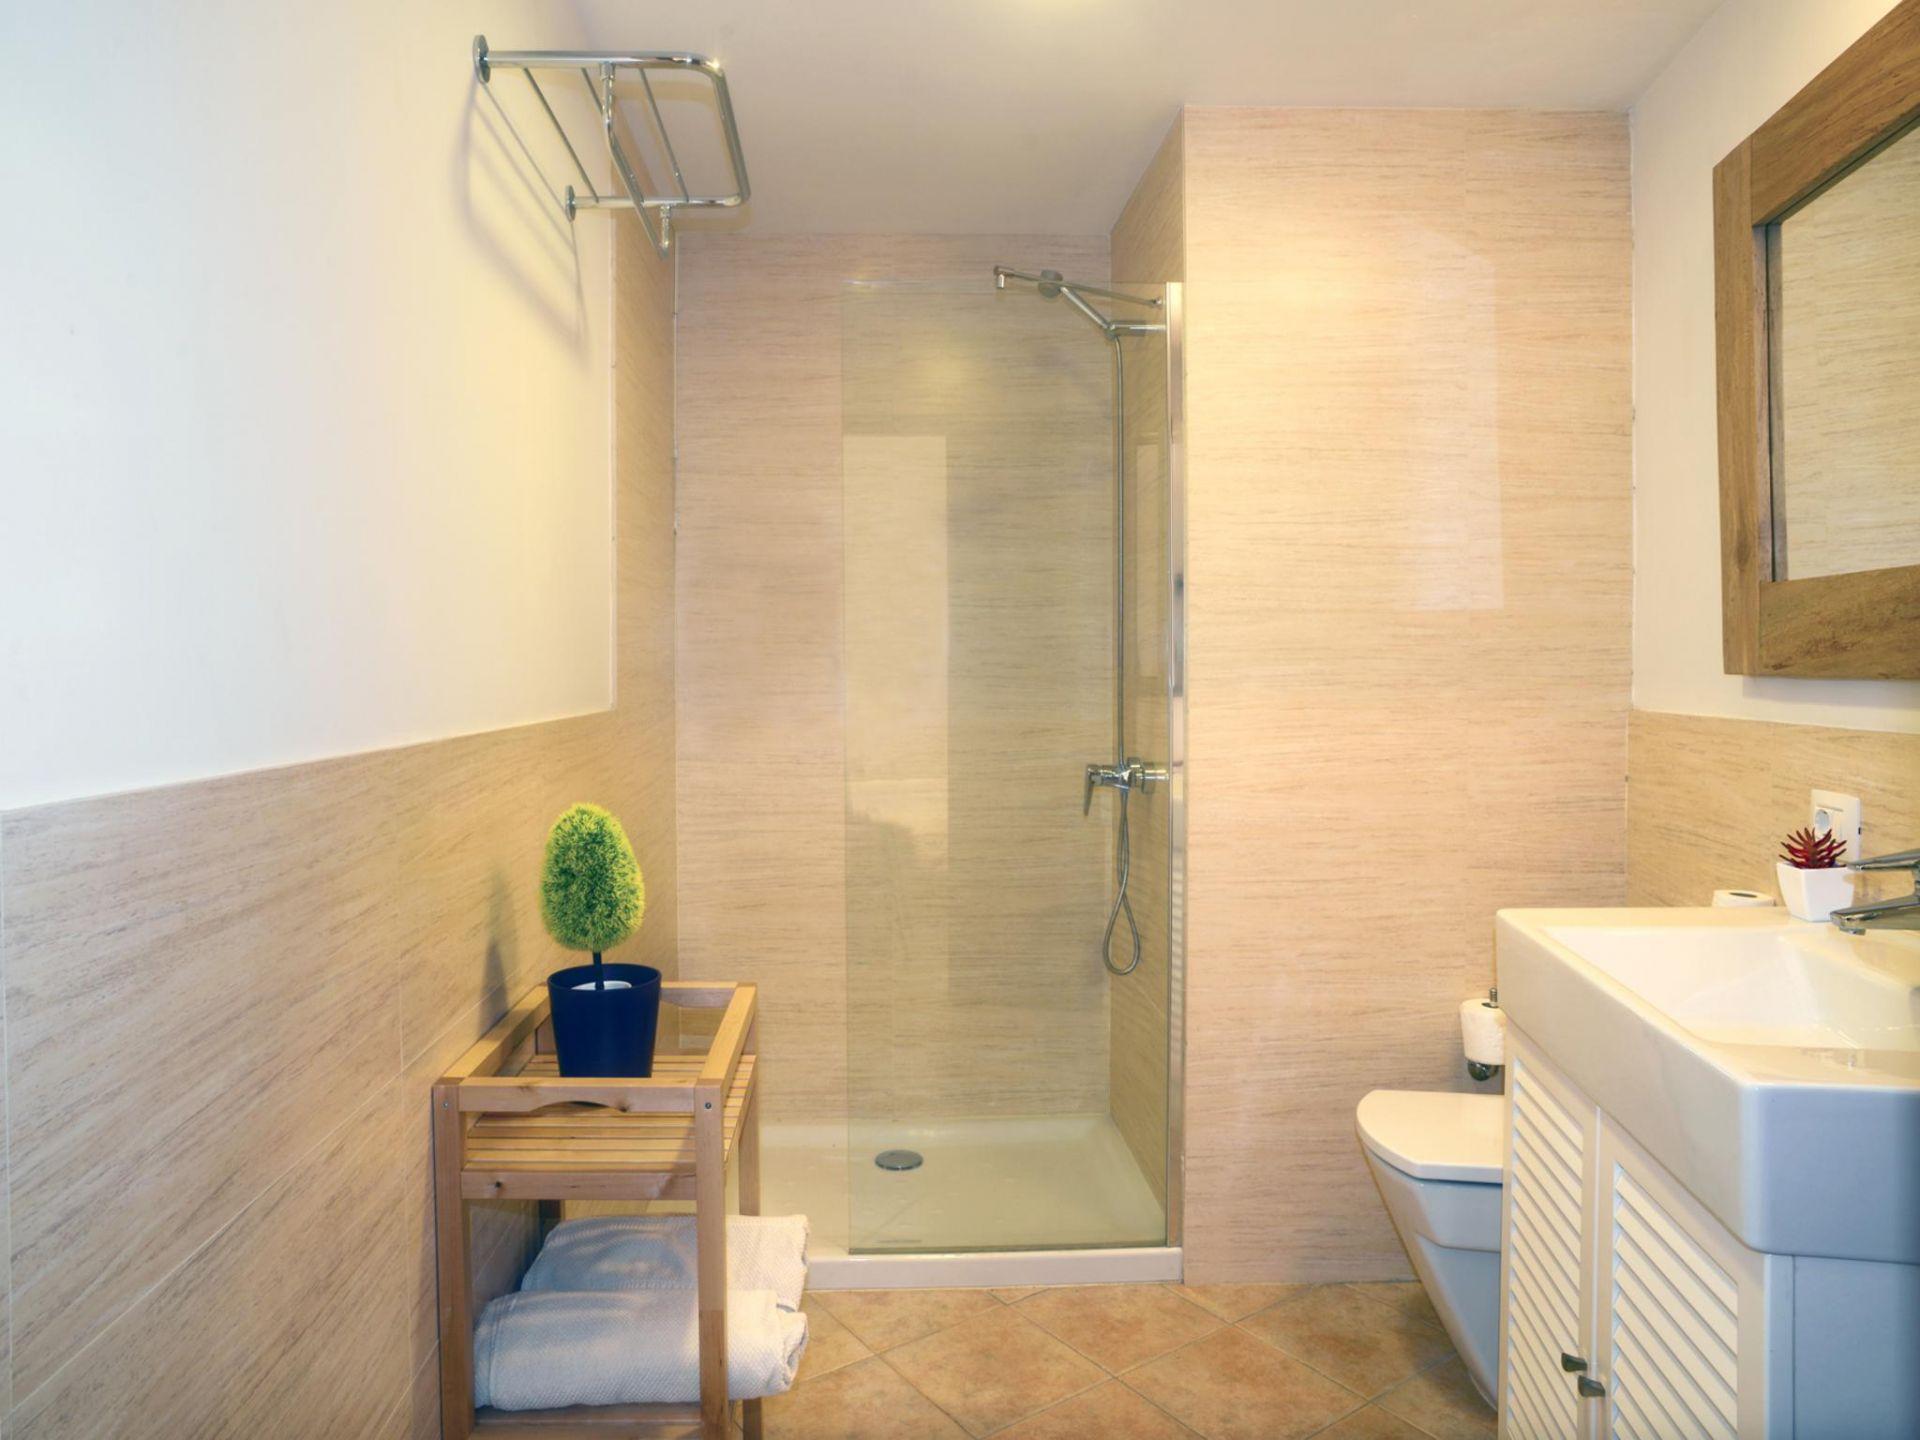 Holiday apartment Villa San Agustin 10 - Holiday Rental (854295), Maspalomas, Gran Canaria, Canary Islands, Spain, picture 31